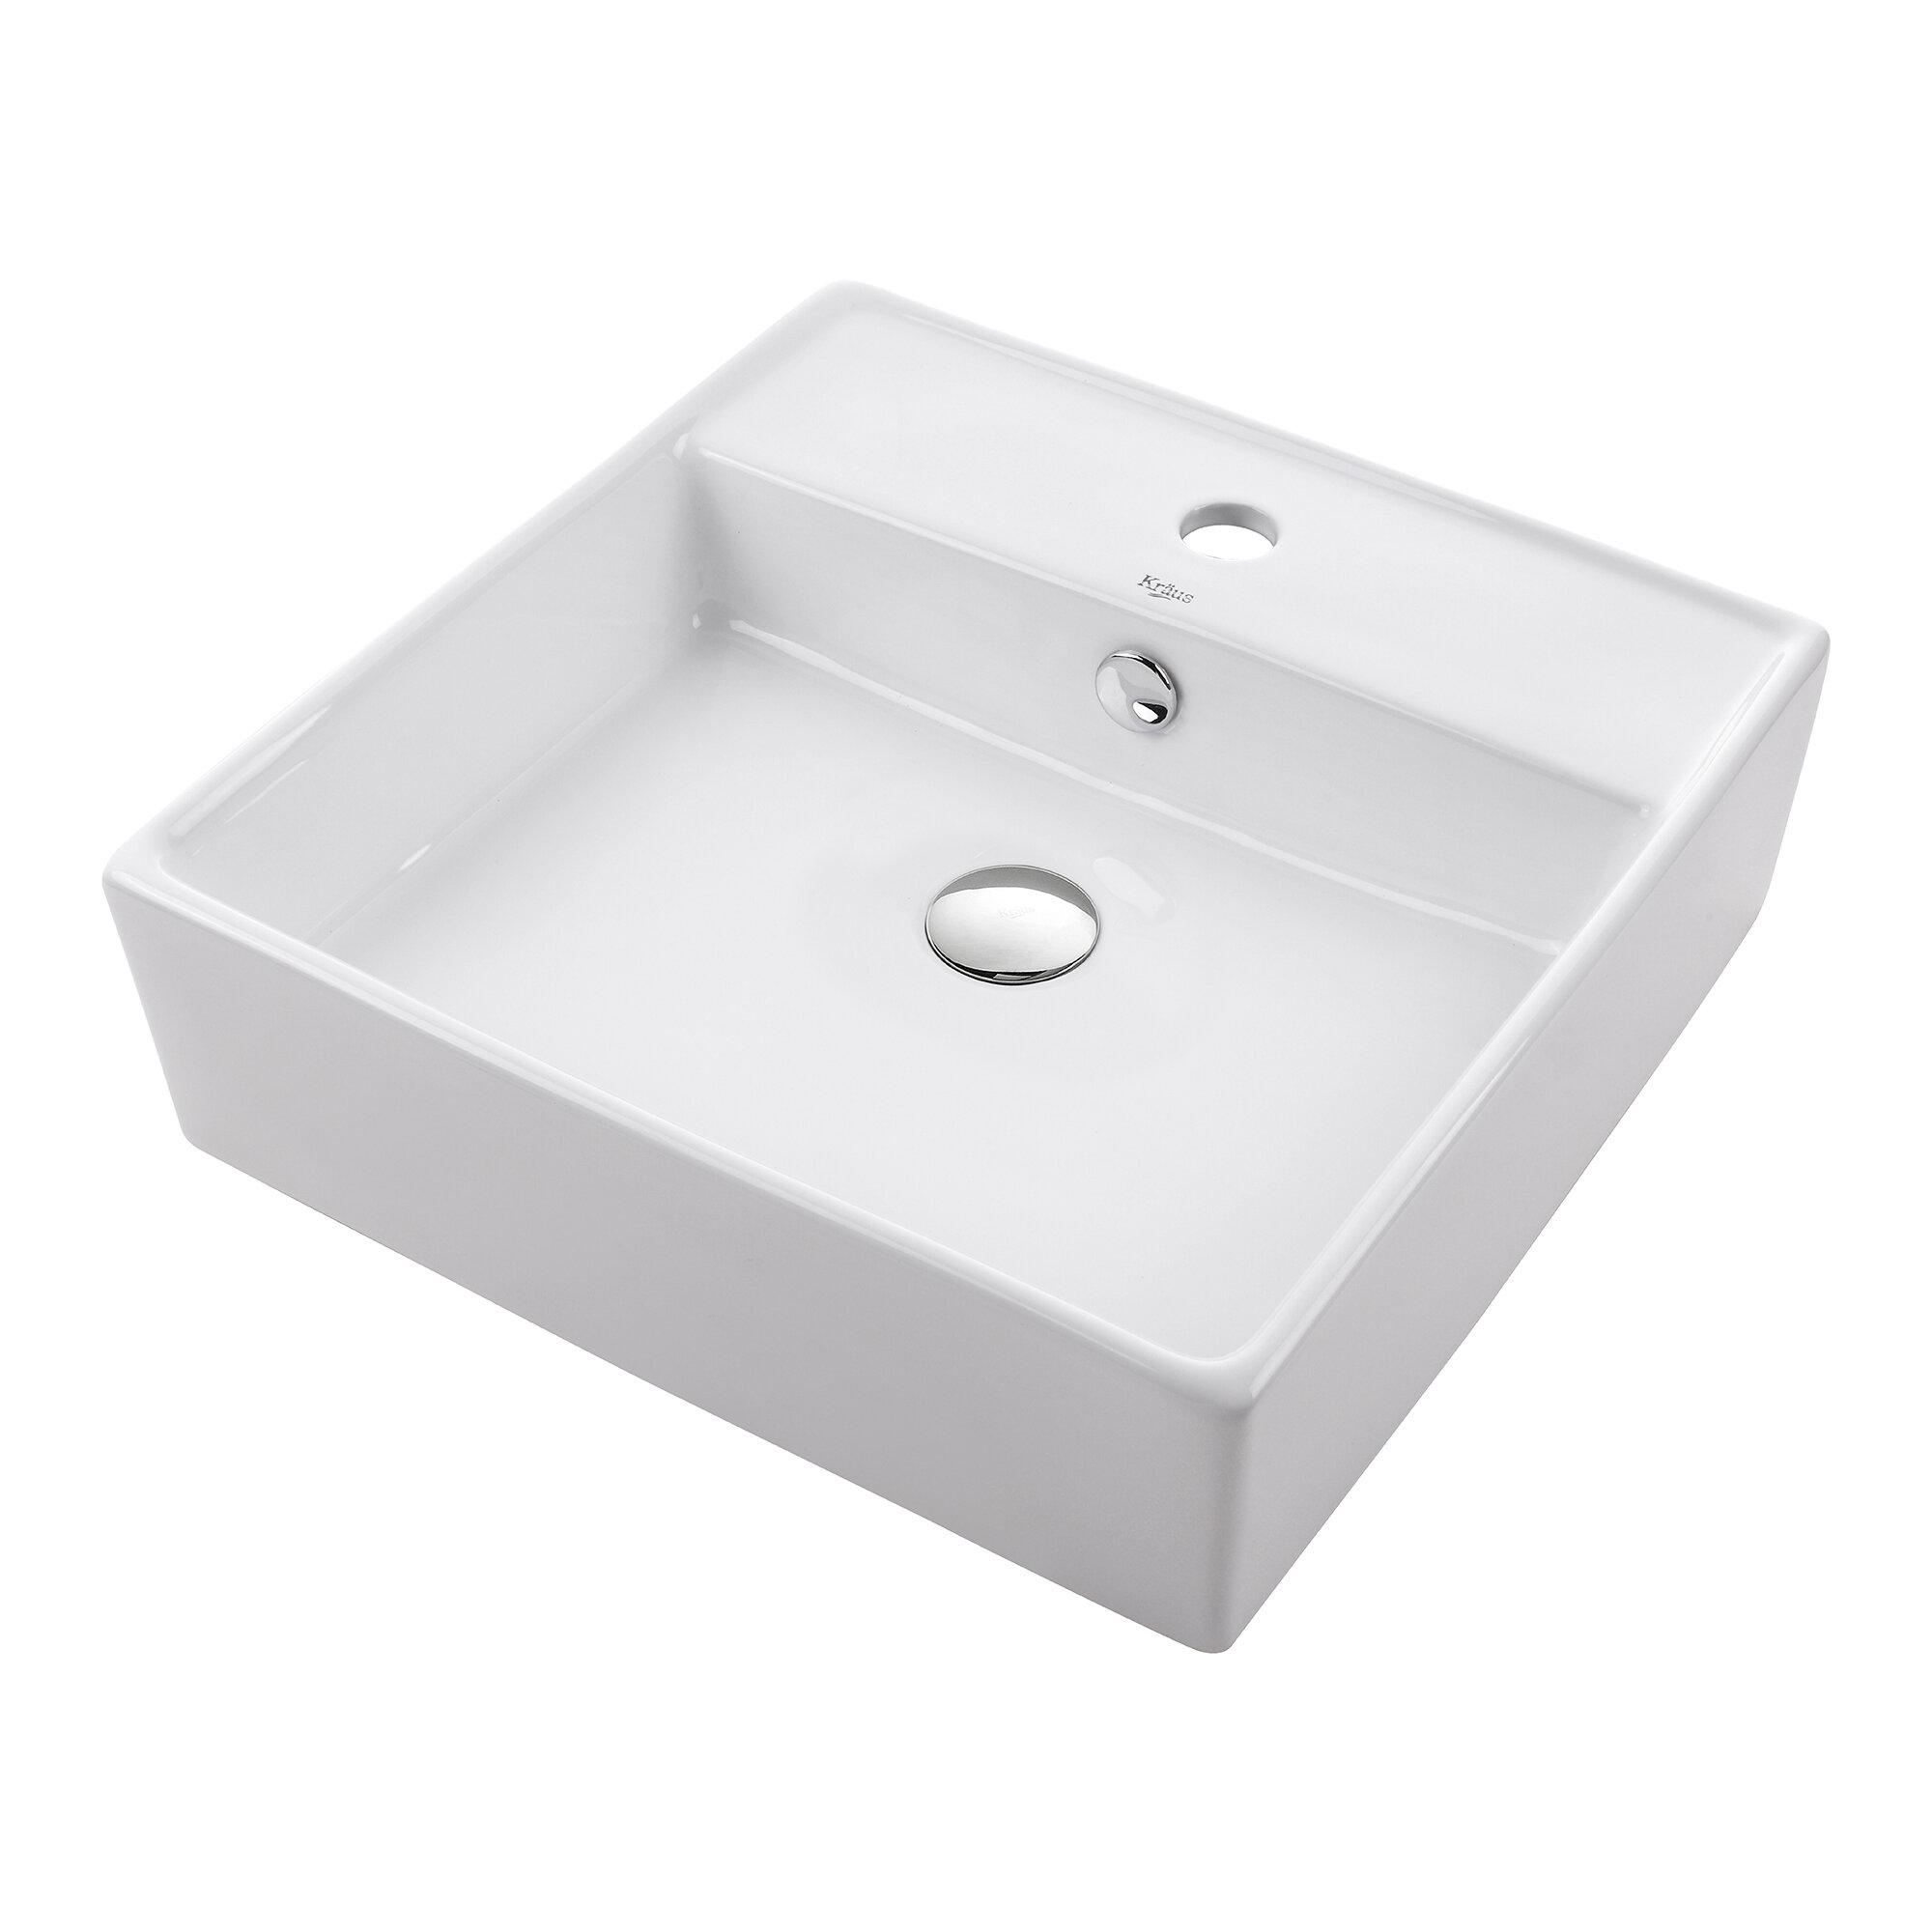 Ceramic Ceramic Square Vessel Bathroom Sink With Overflow Reviews Allmodern